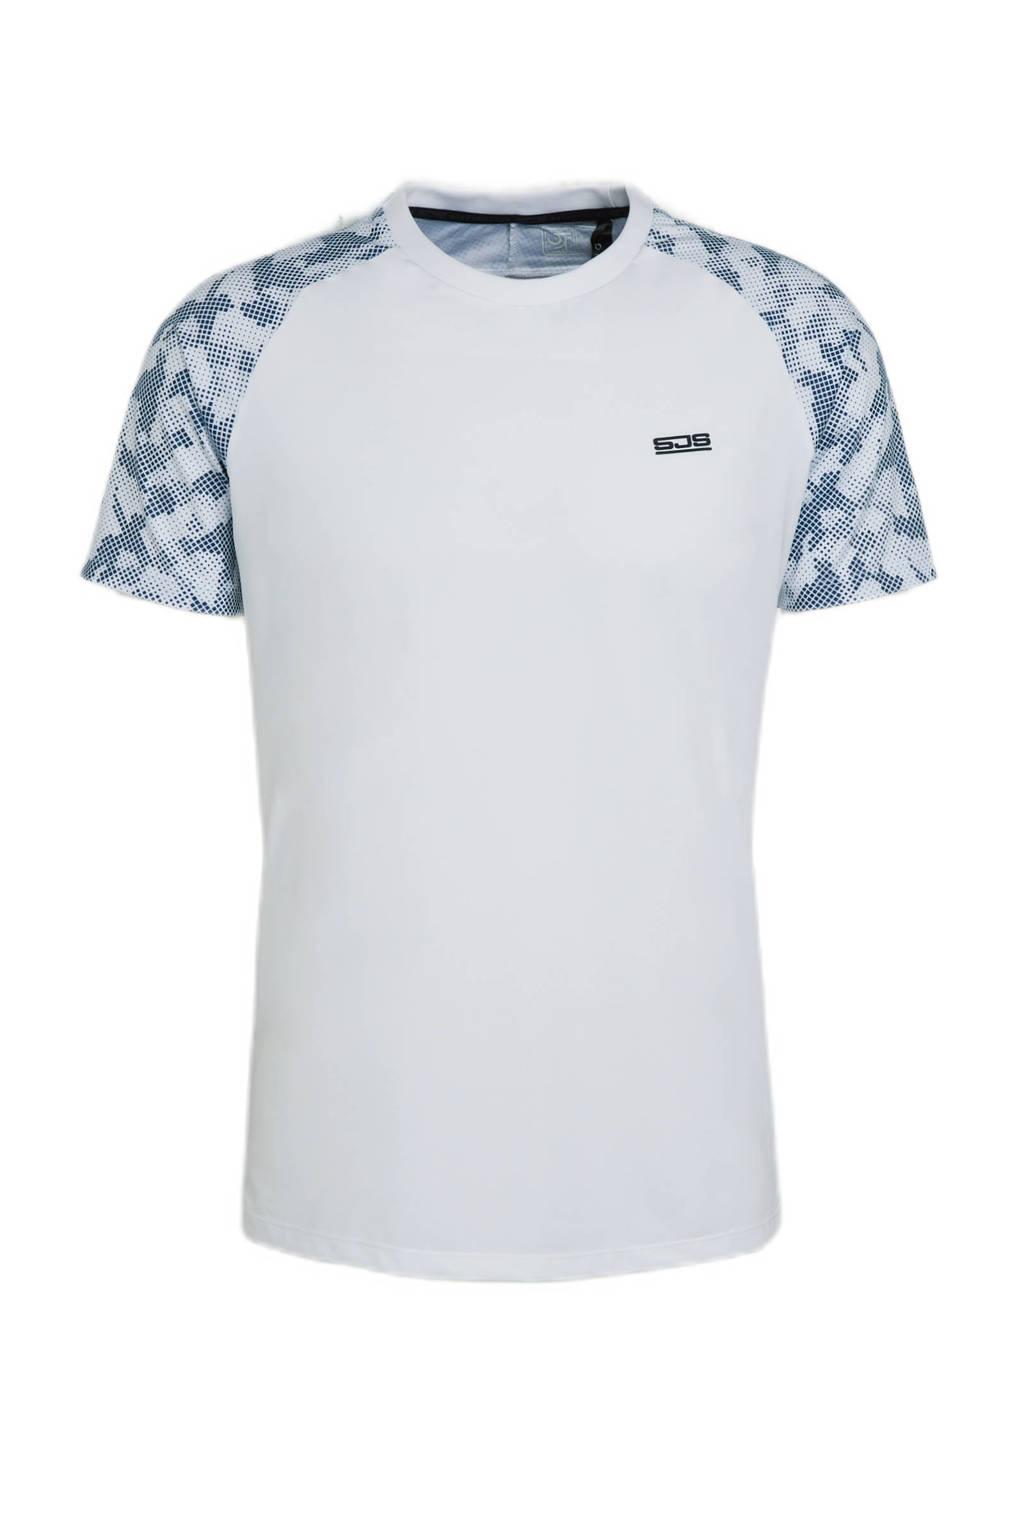 Sjeng Sports   sport T-shirt Hughie wit/blauw, Wit/blauw